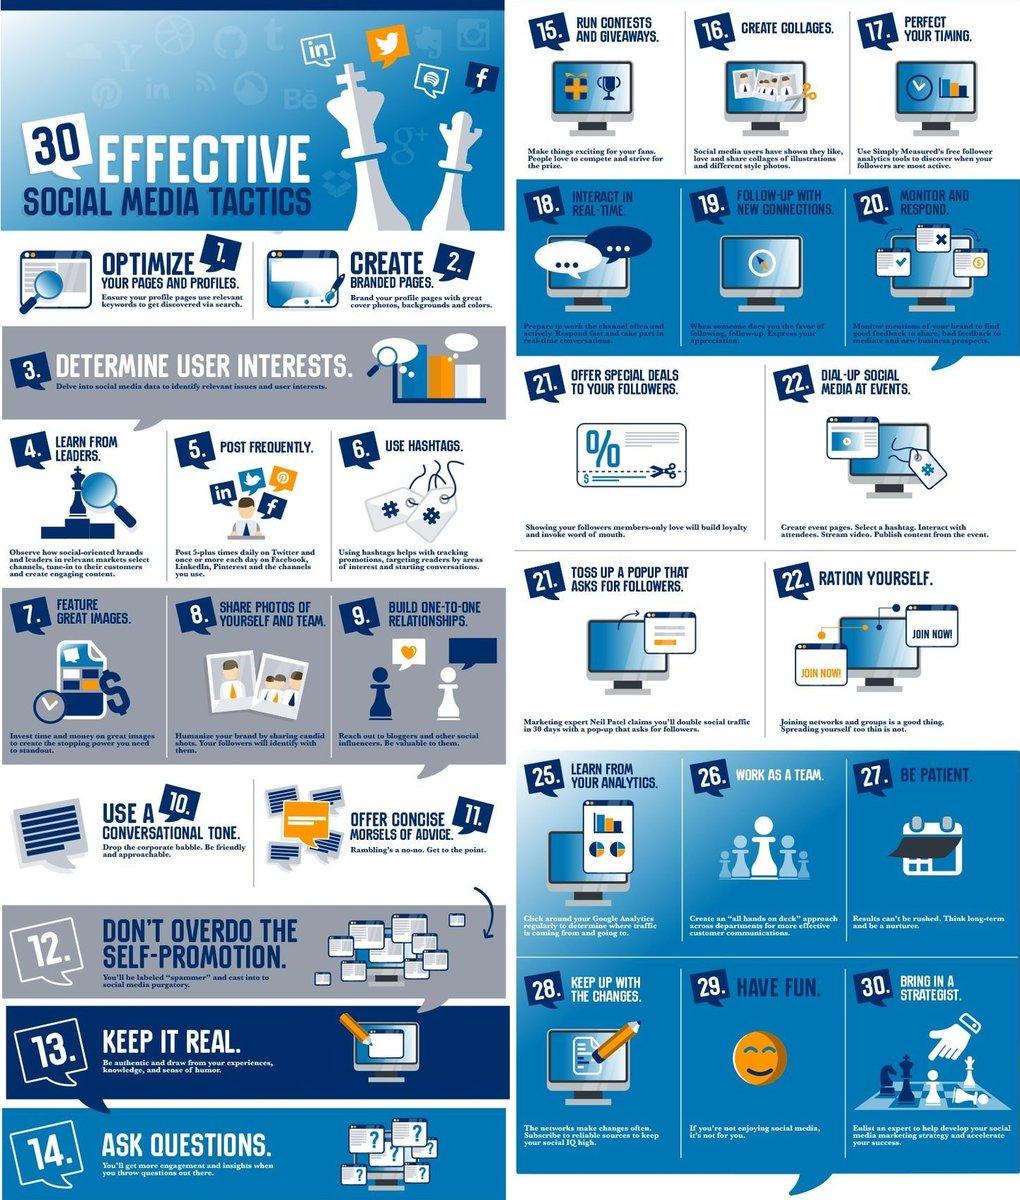 #Socialmedia tactics #DigitalMarketing #SEO #Internetmarketing #Mpgvip #defstar5 #makeyourownlane #Growthhacking #OnlineMarketing #Abhiseo<br>http://pic.twitter.com/LDrobnvbde